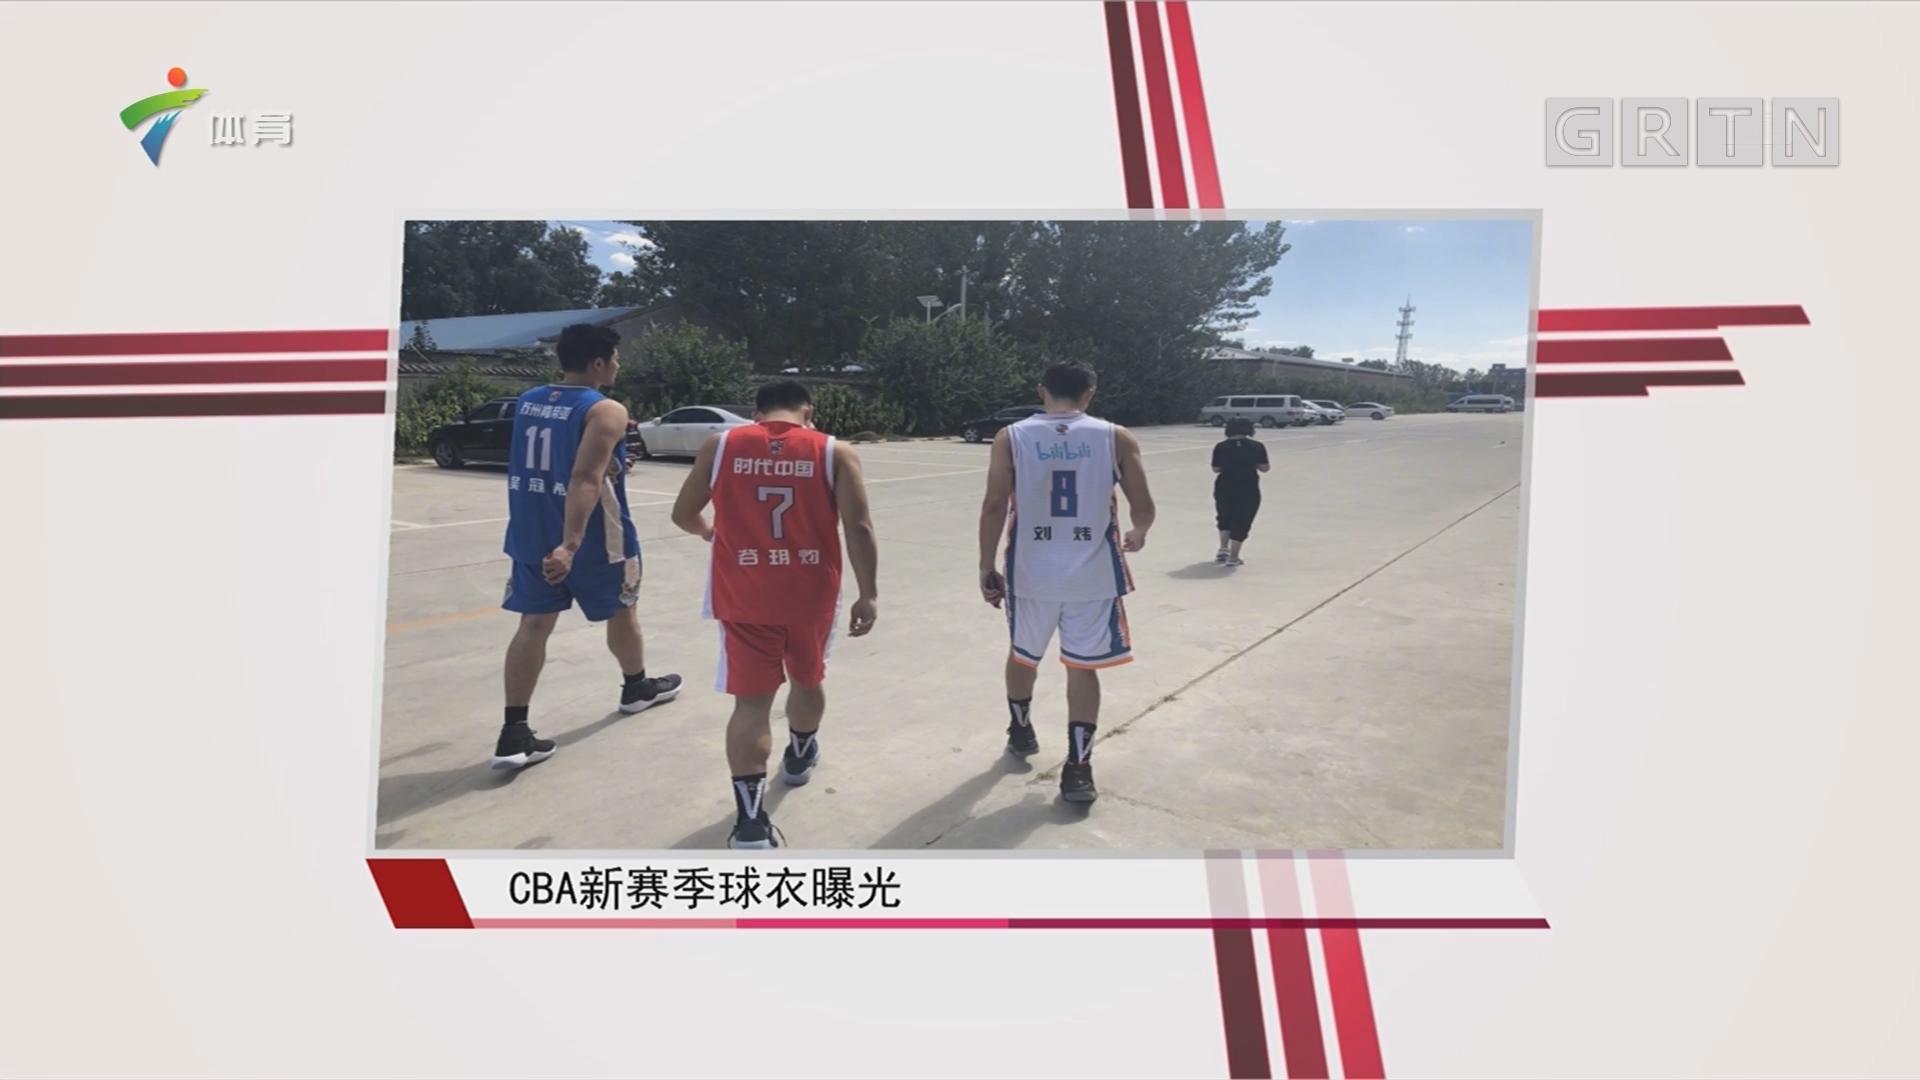 CBA新赛季球衣曝光